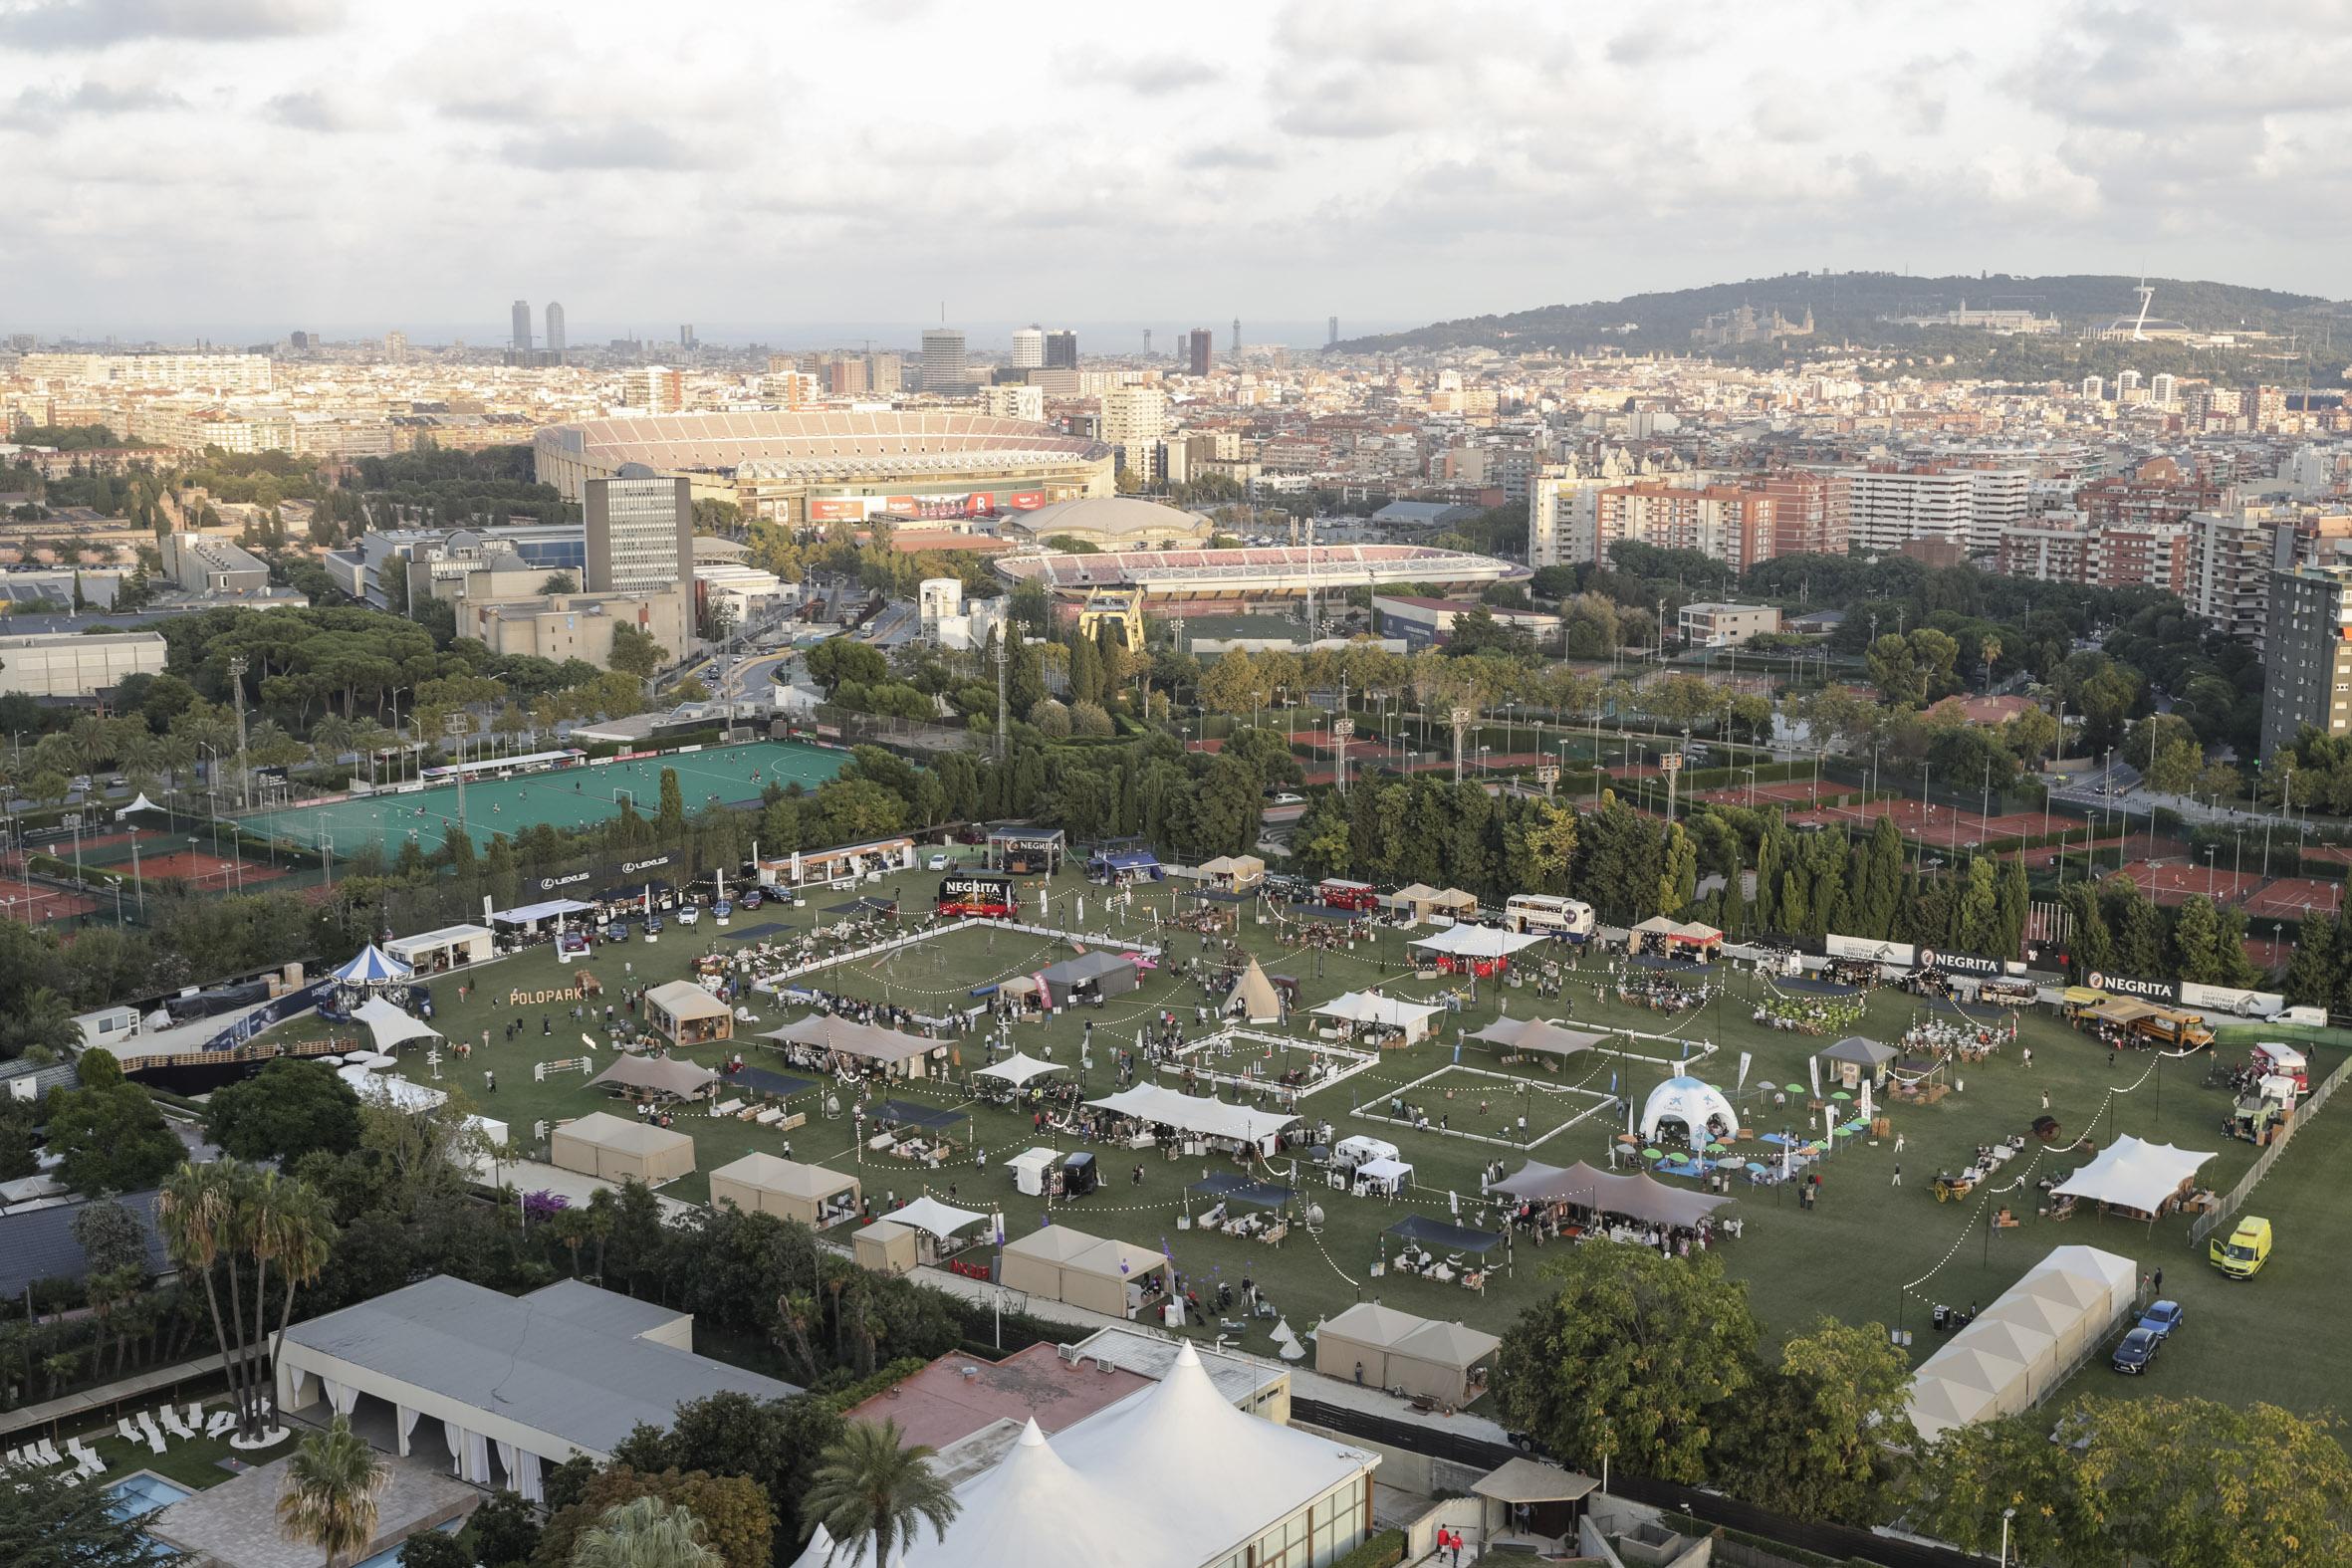 CSIO Barcelona - Real Club de Polo Barcelona